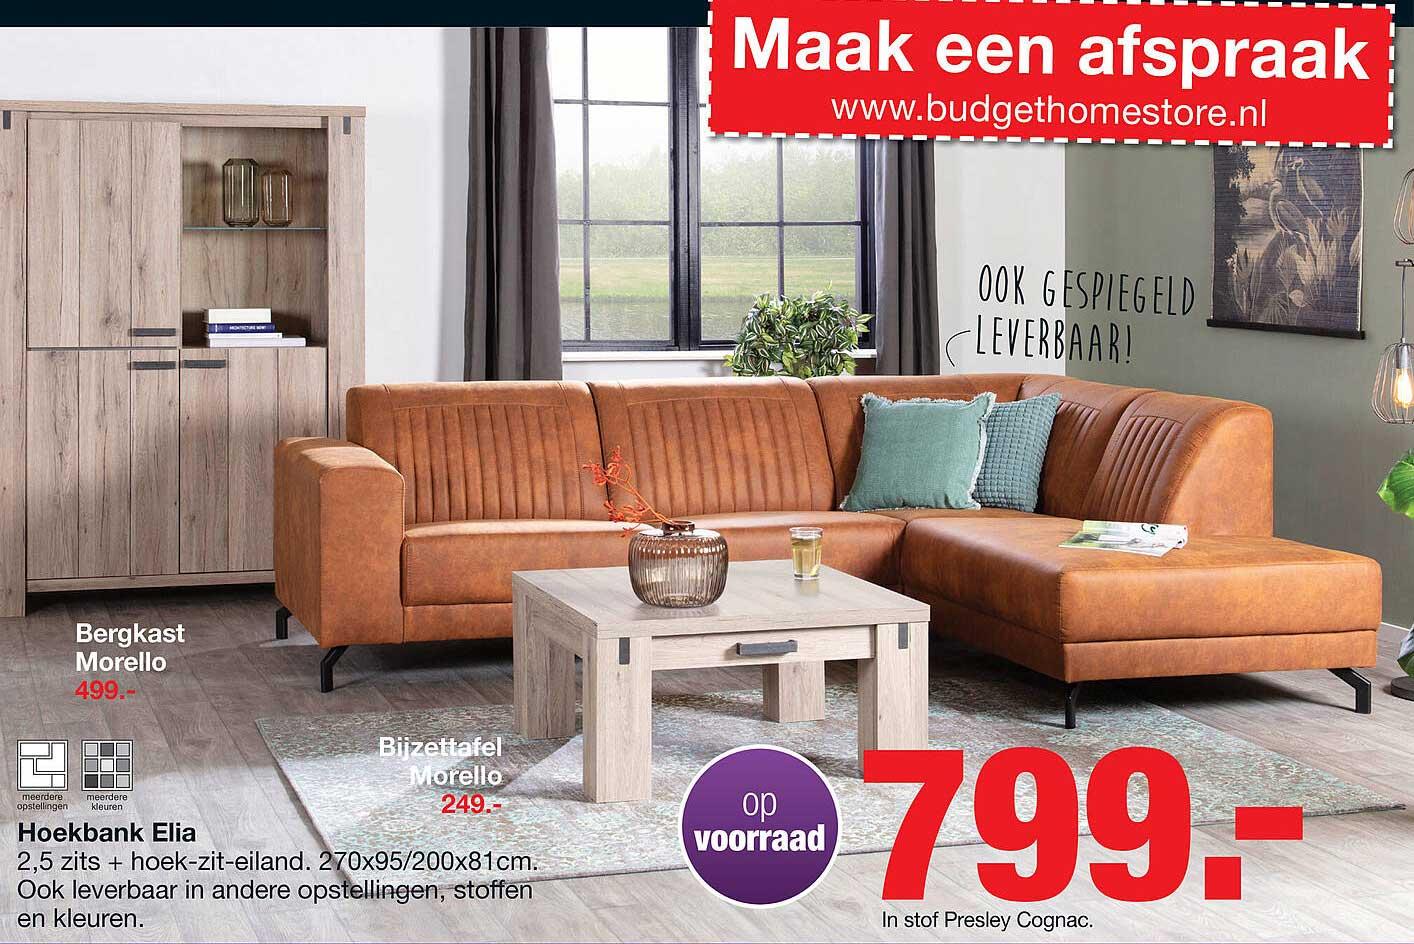 Budget Home Store Bergkast Morello, Bijzettafel Morello Of Hoekbank Elia